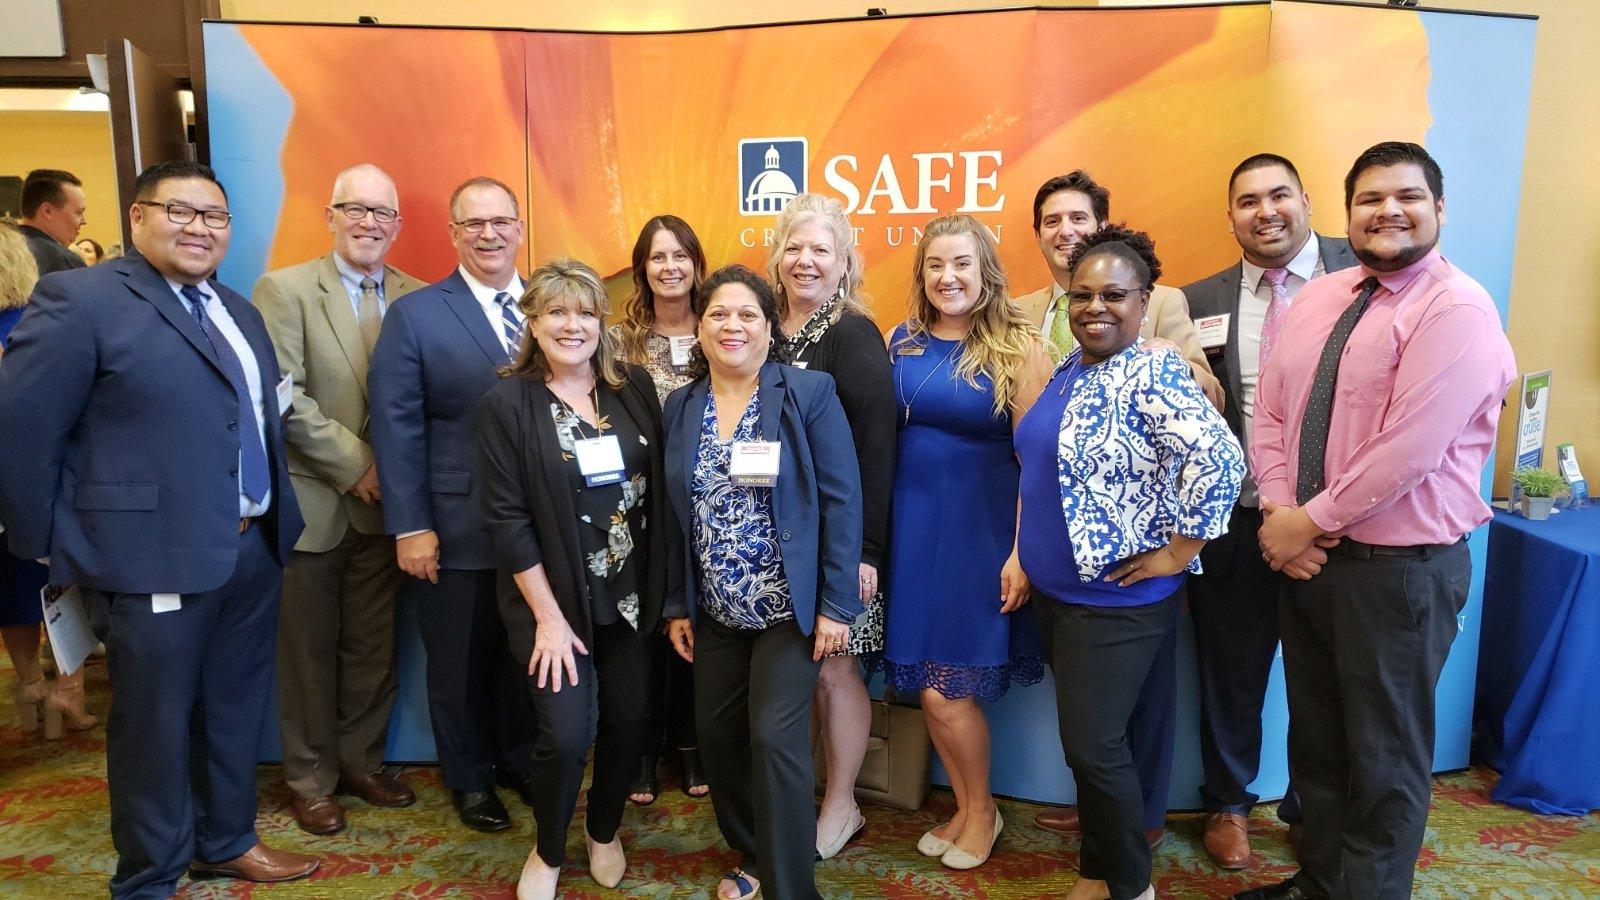 SAFE Credit Union staff